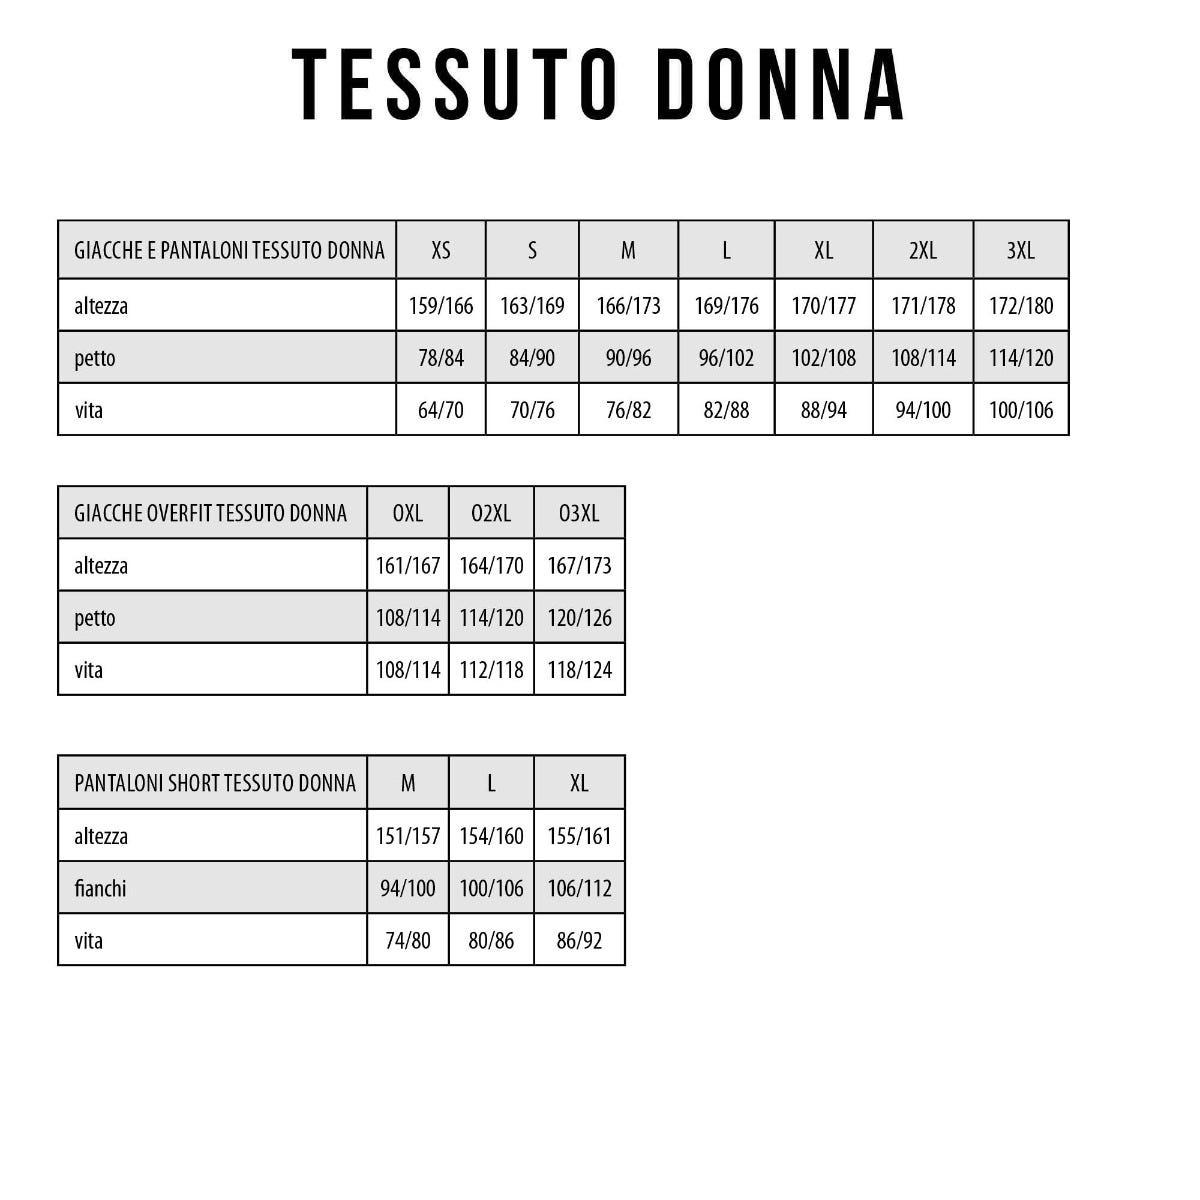 ns-marchi_donna_tex_it_09-21